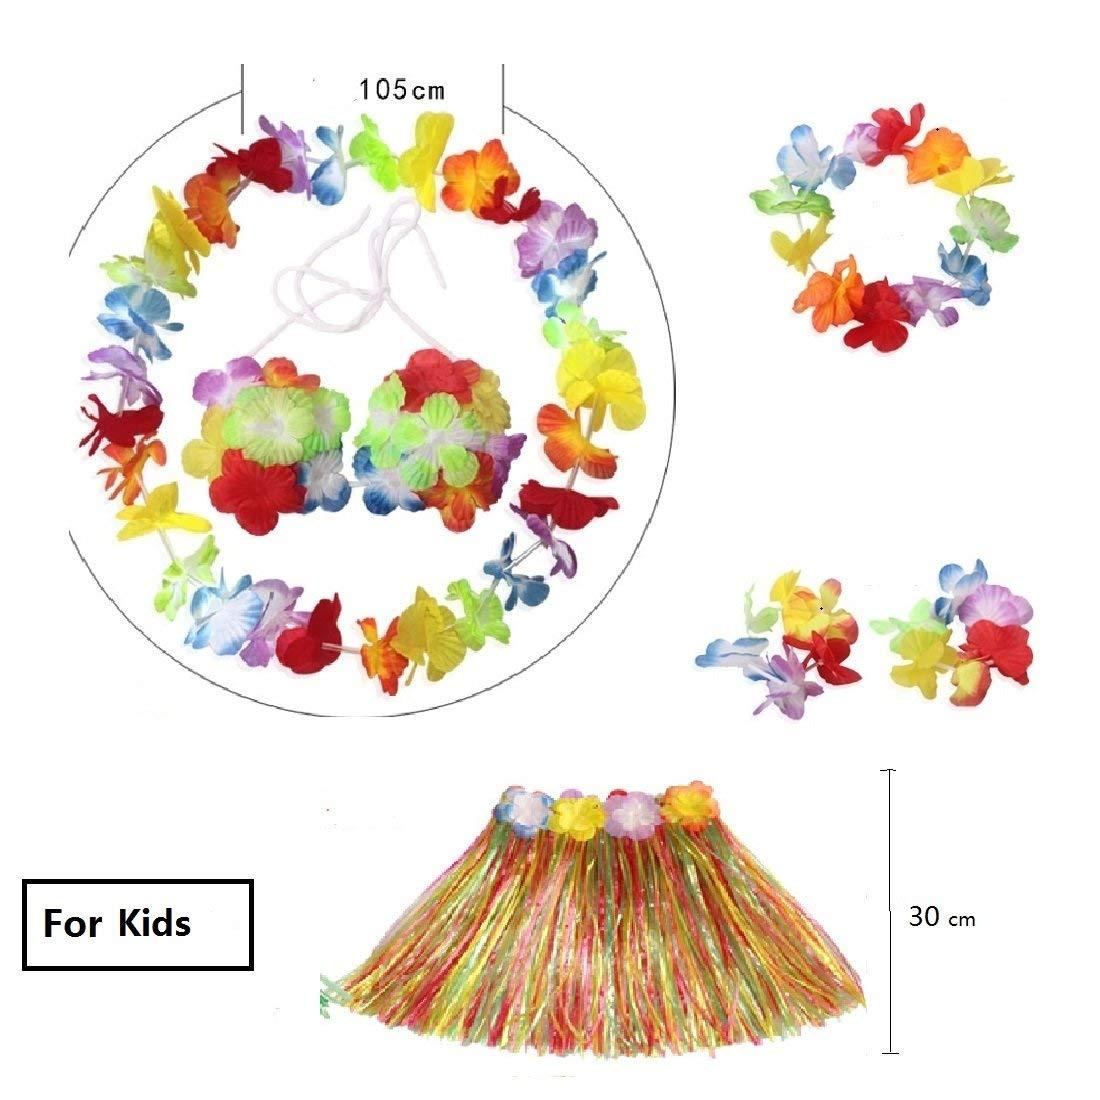 Cheap fancy dress flower find fancy dress flower deals on line at get quotations kaymayn 6 pieces for a set hawaiian multi coloured lei flower garlandsilk flowers izmirmasajfo